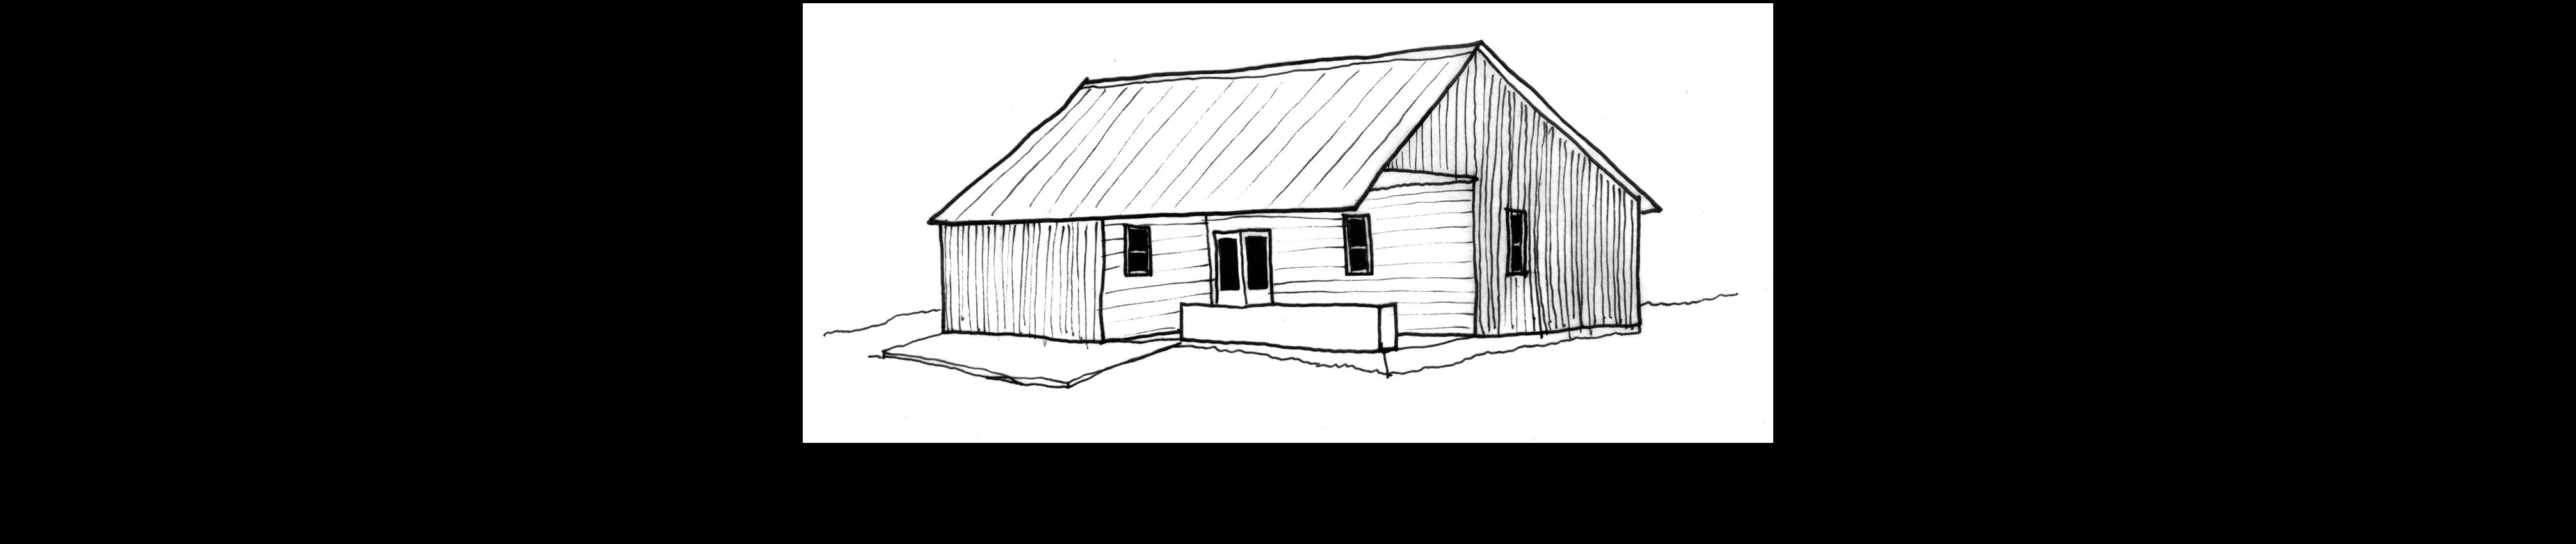 annas home rendering